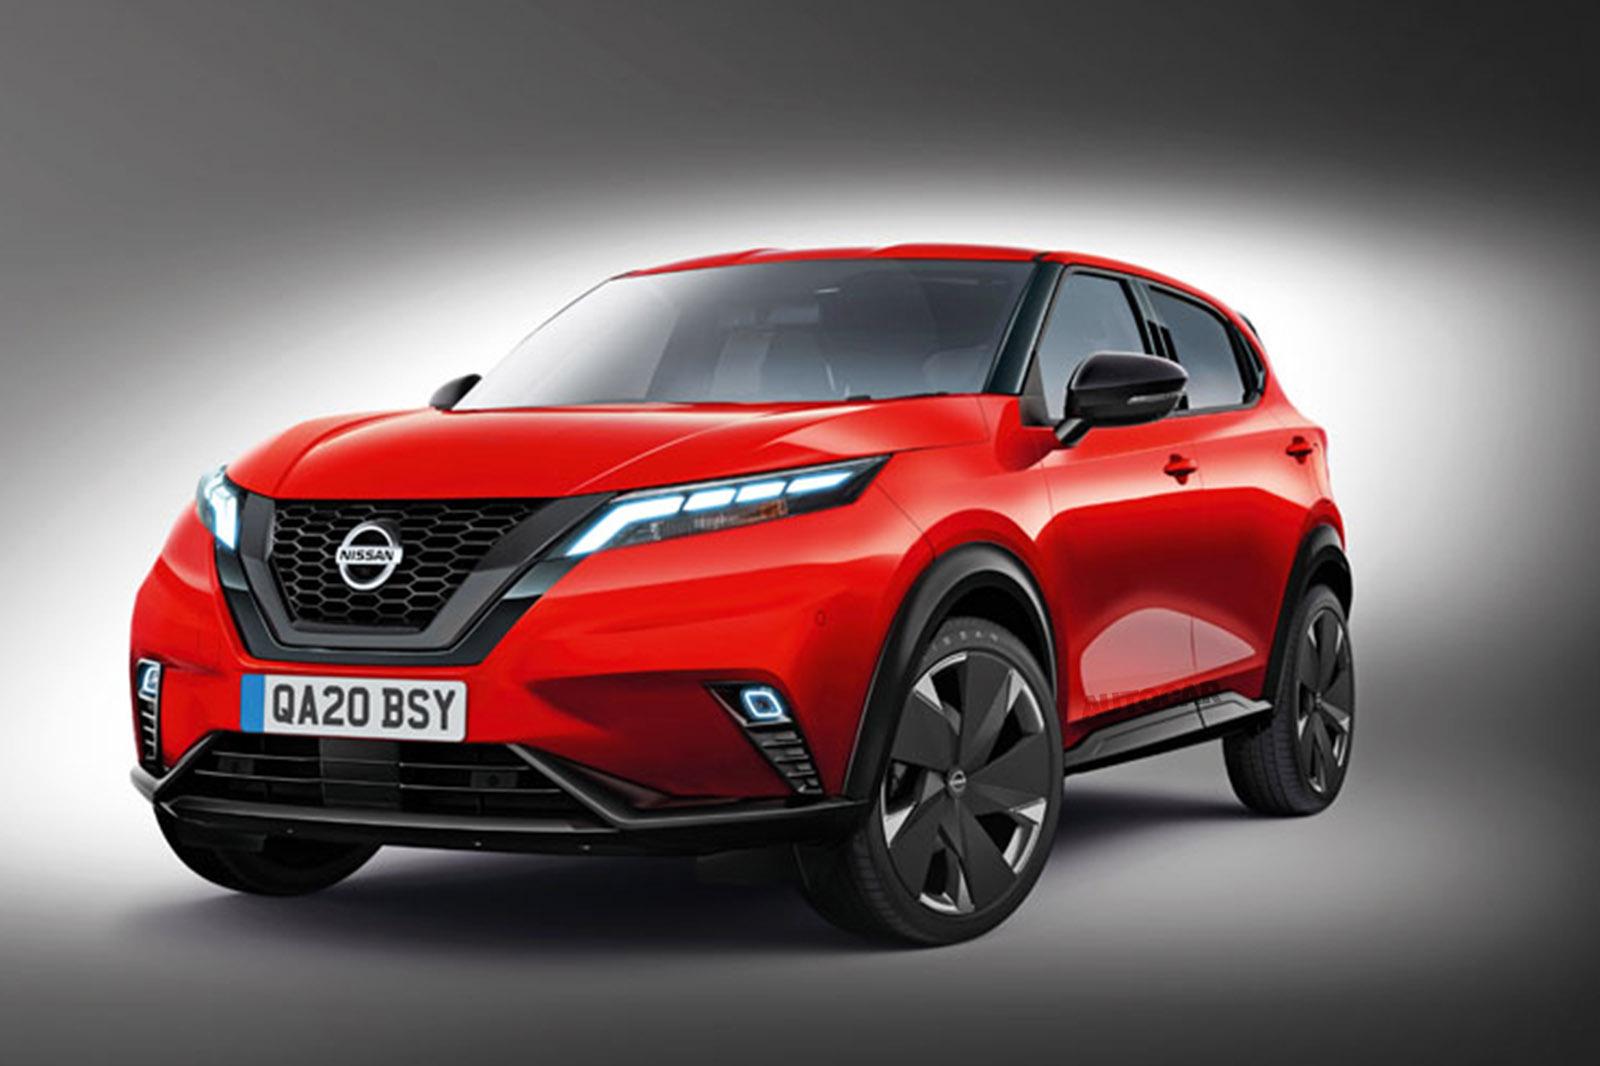 New 2020 Qashqai Key To Nissan S Three Pronged Suv Assault Autocar